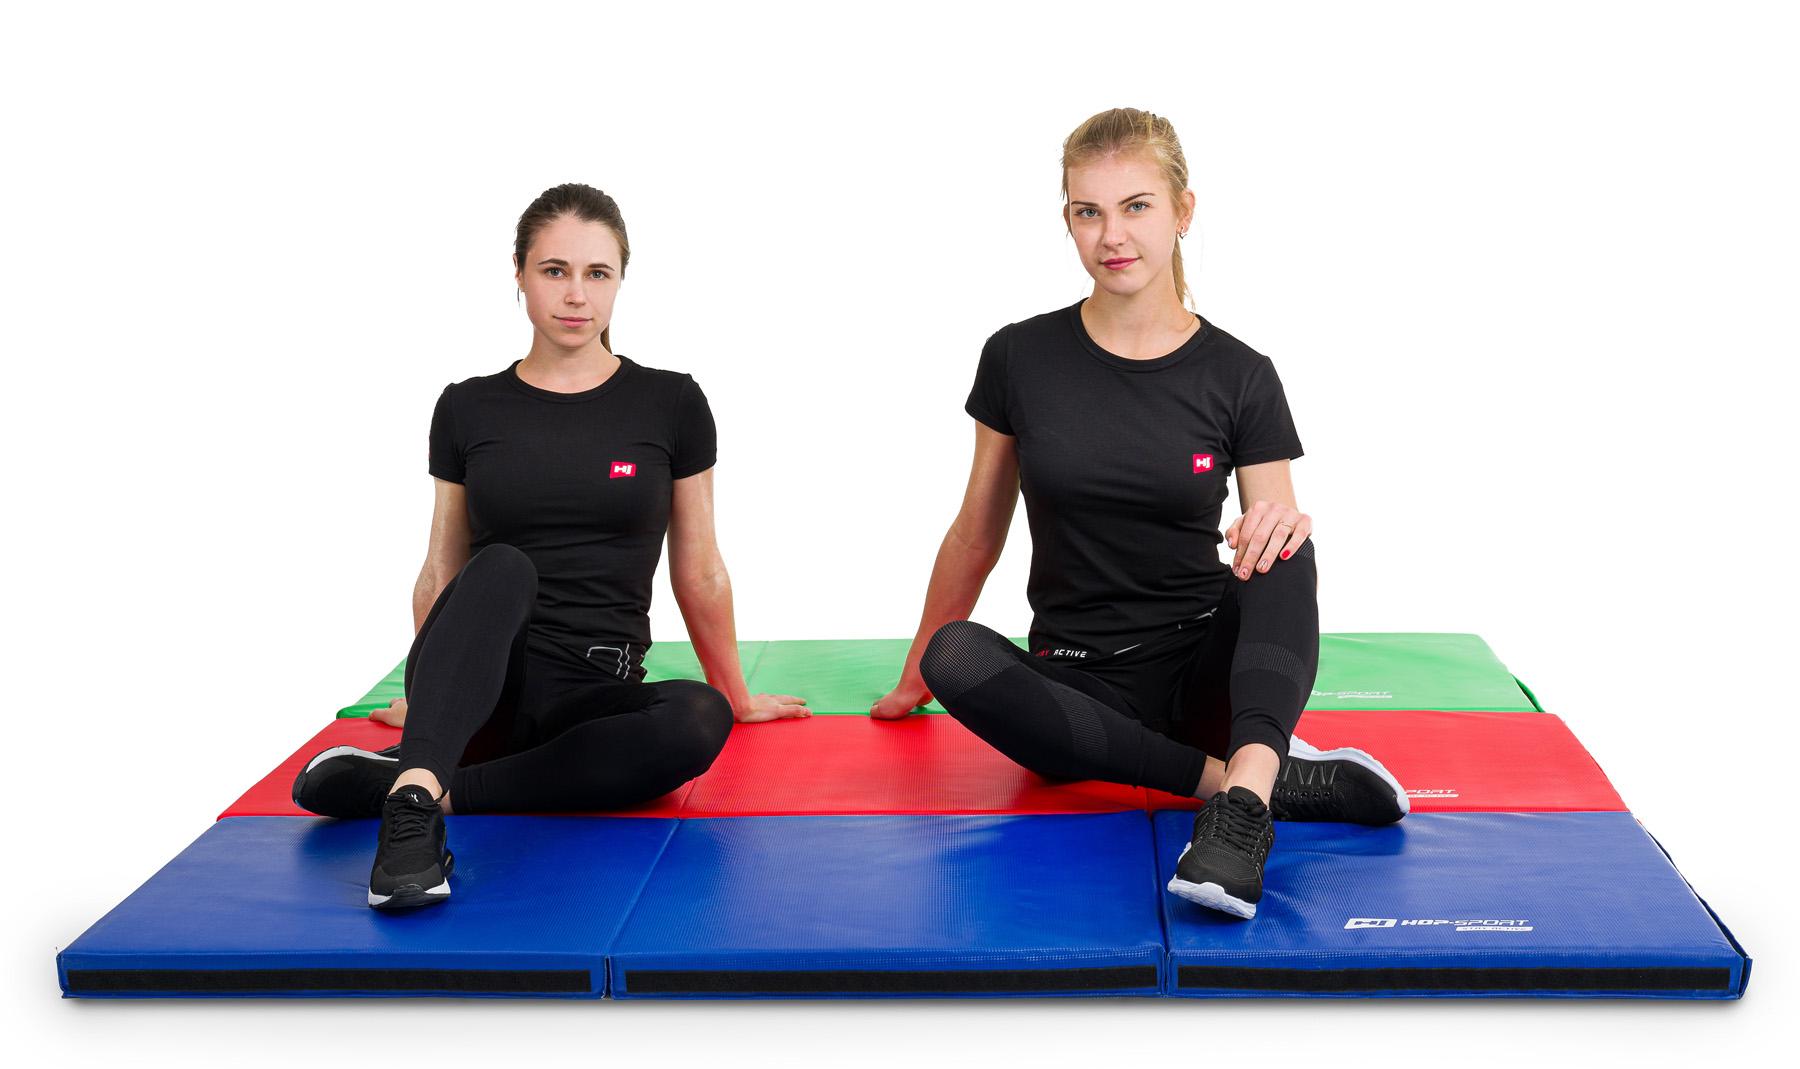 Faltmatte Gymnastikmatte Anti-Rutsch hart 5cm HS-065FM Rot